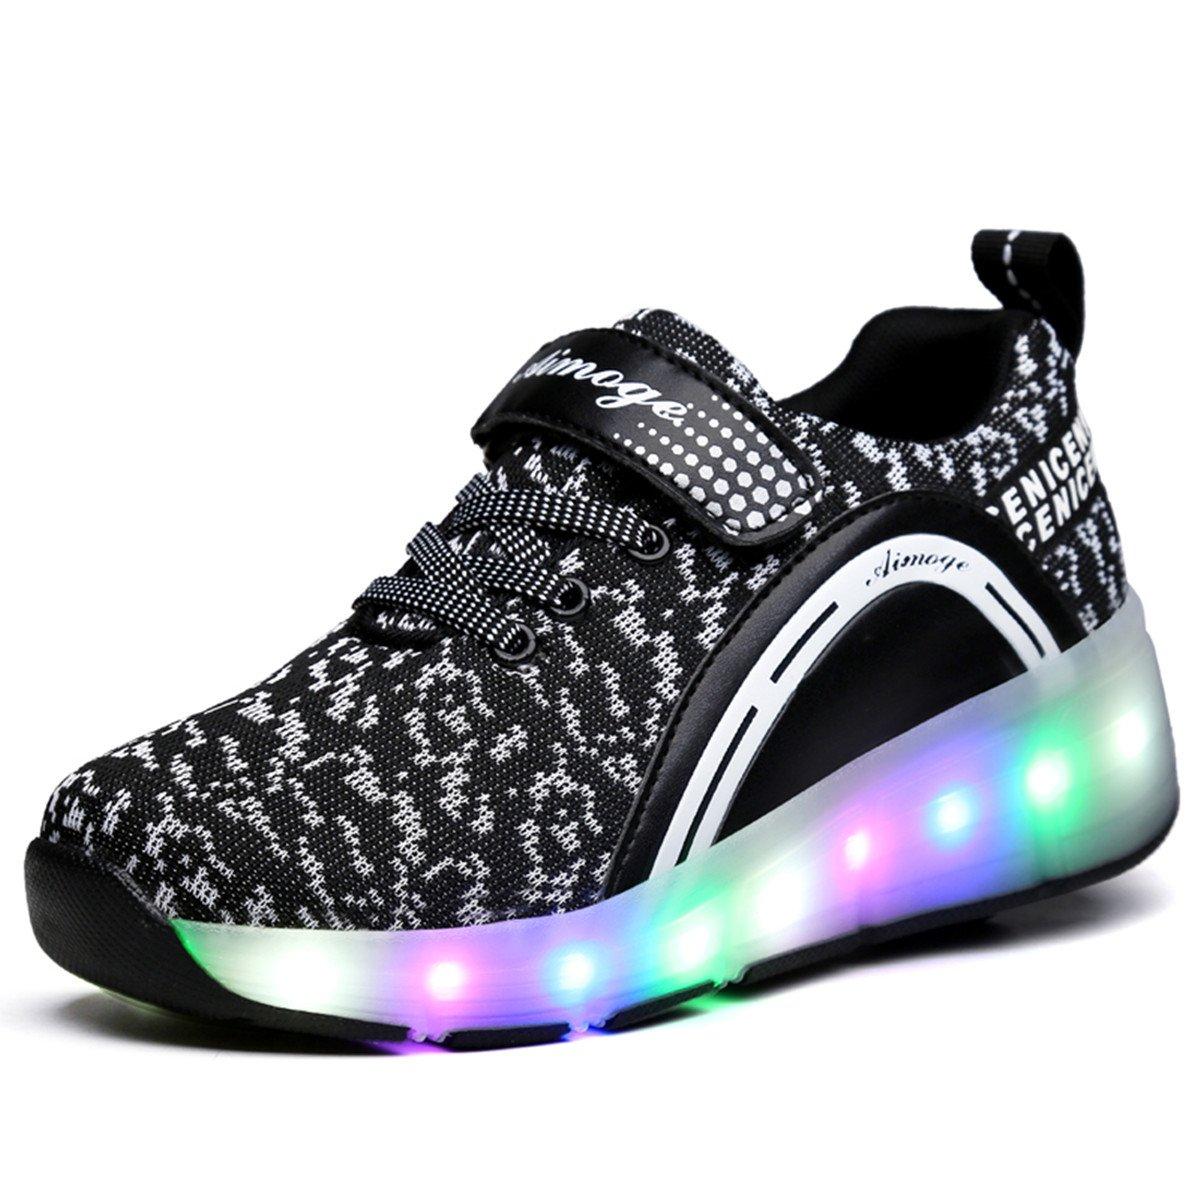 VMATE LED Light Up Roller Skate Shoes Blink Single Wheel Fashion Sports Flashing Sneaker Boys Girls Kid